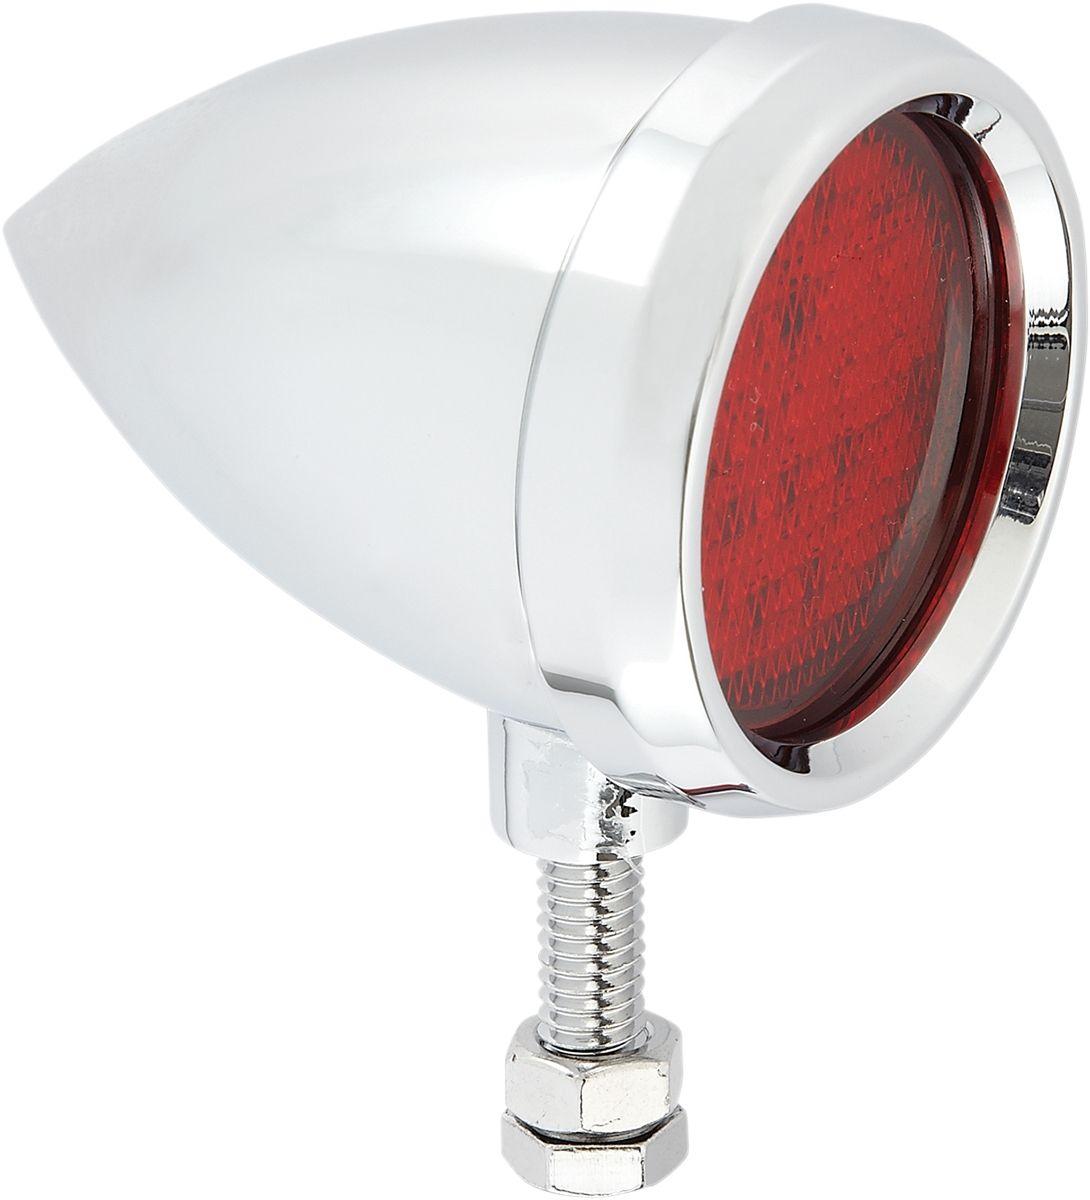 【ARLEN NESS】LED 方向燈 CH RED [2040-0836] - 「Webike-摩托百貨」